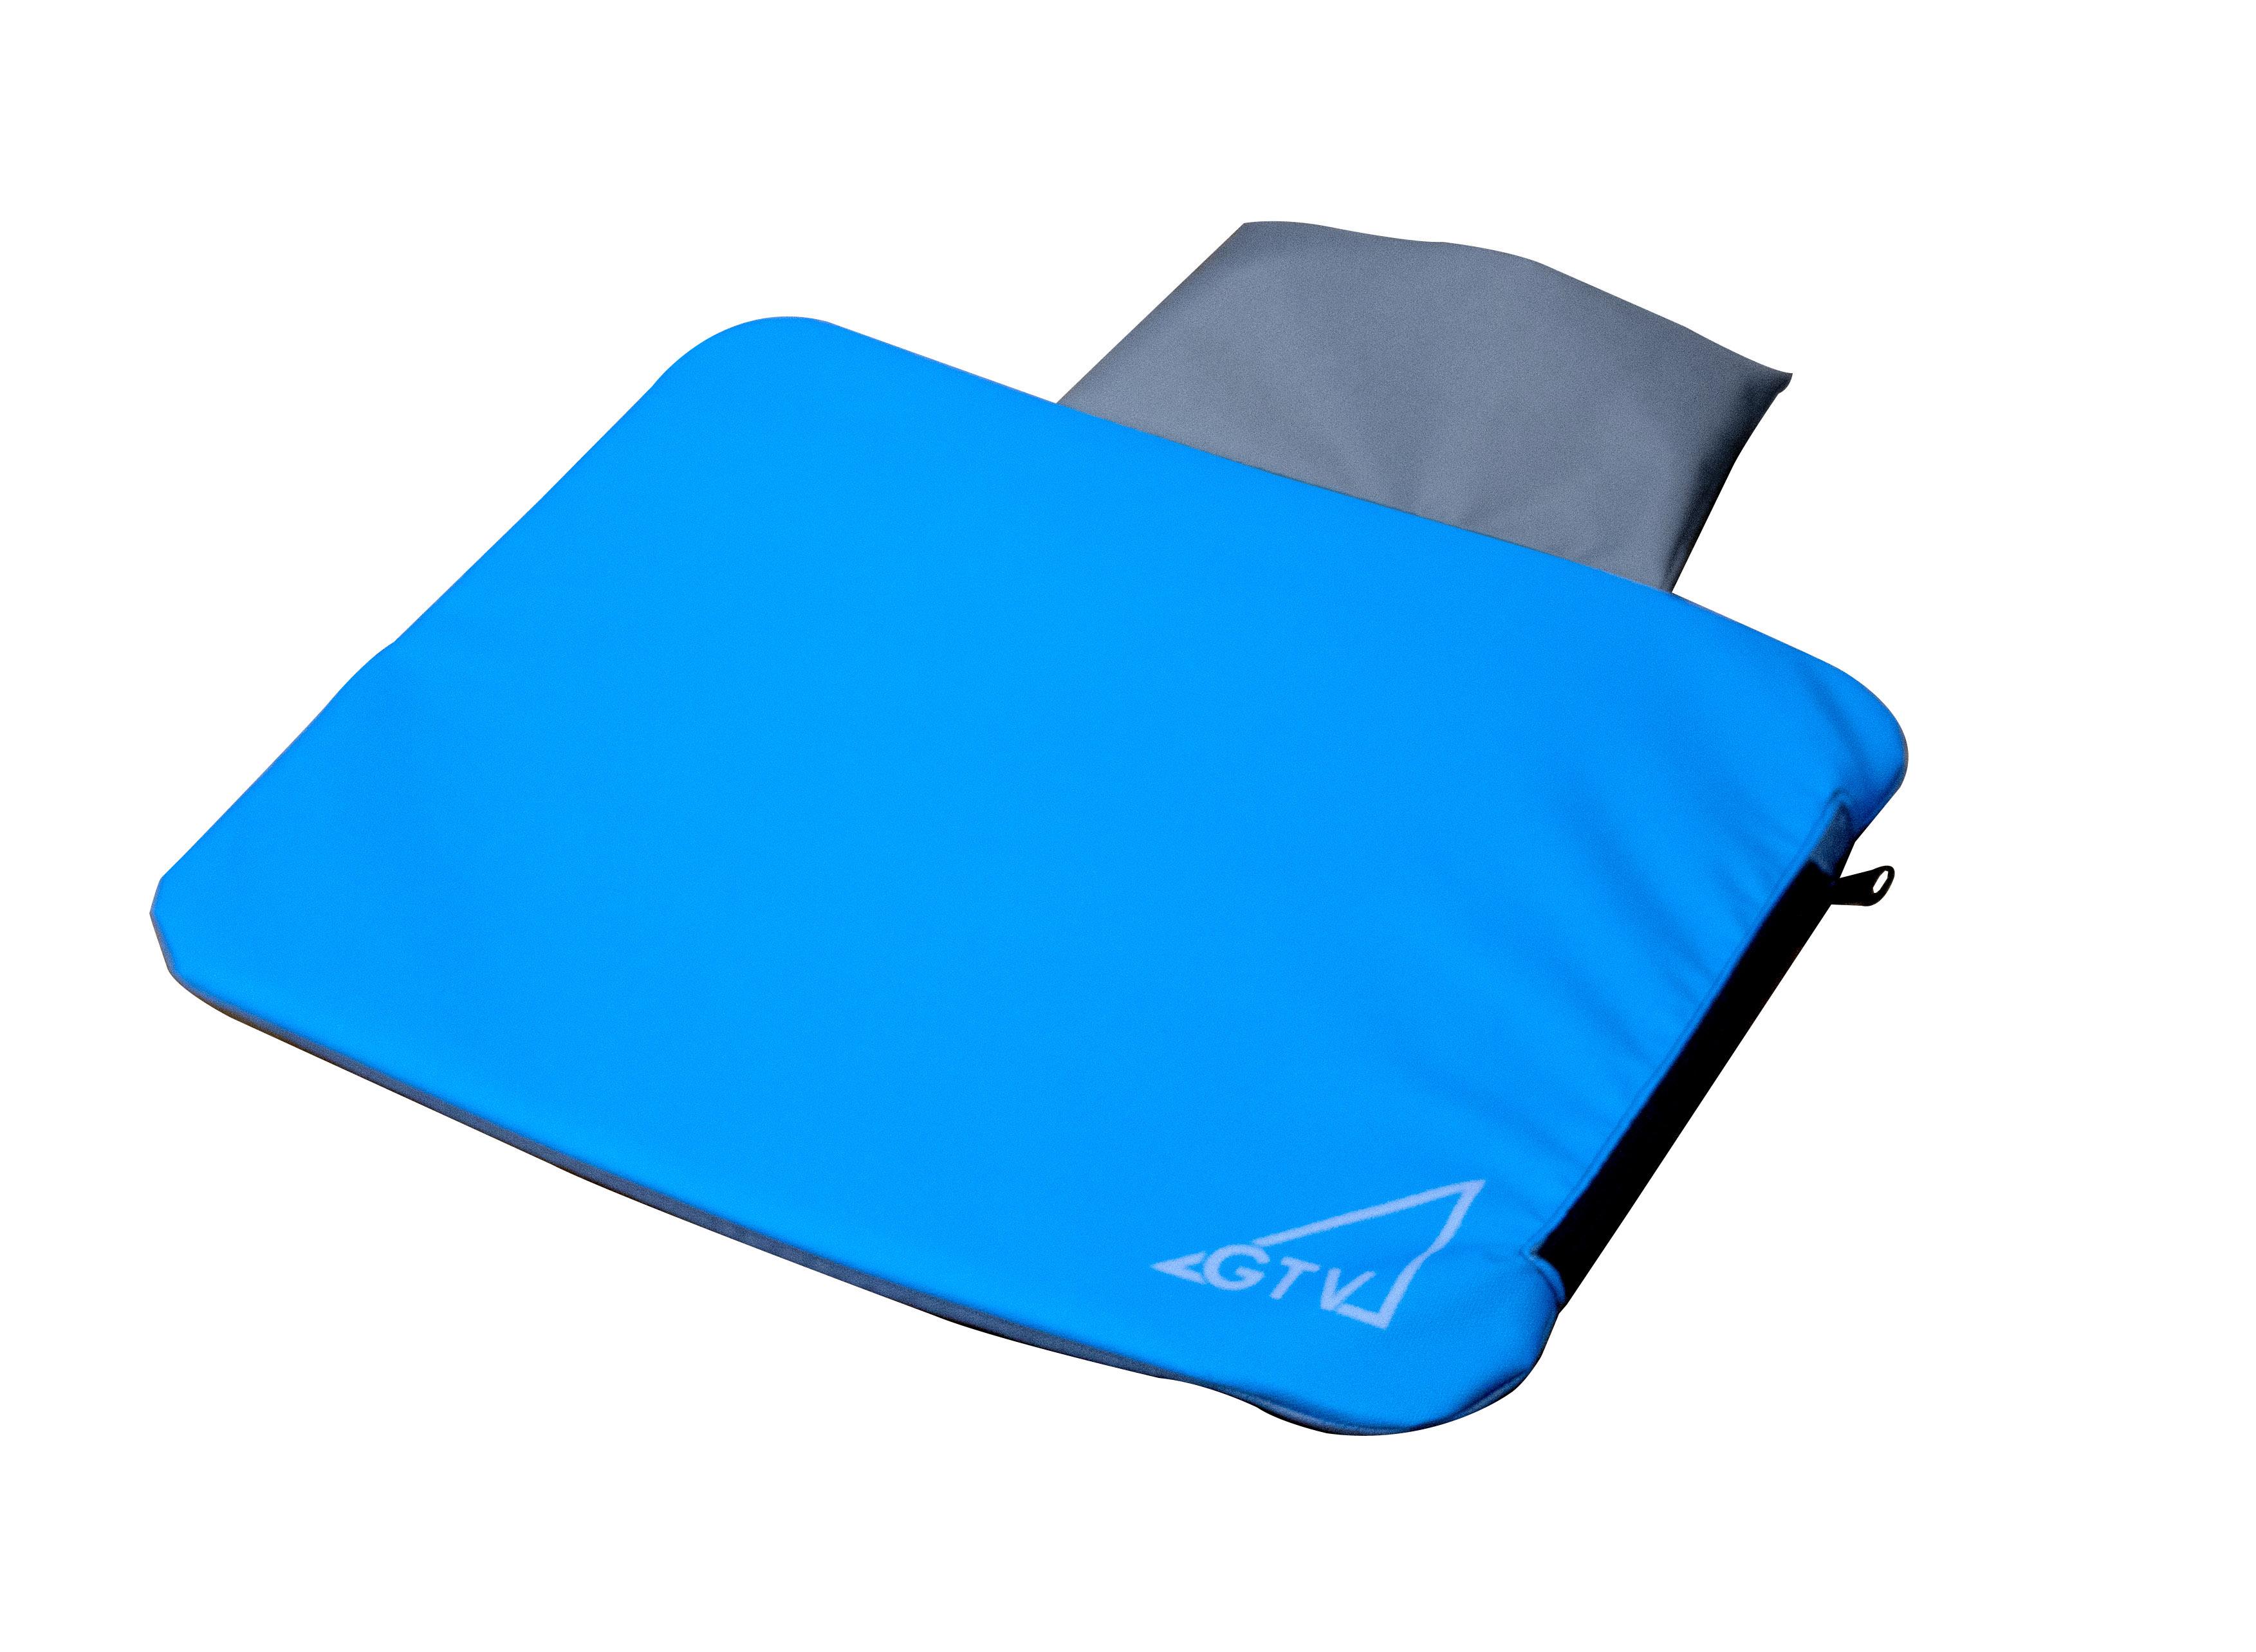 Heiz-Sitzkissen HeatUp - All-Over Druck